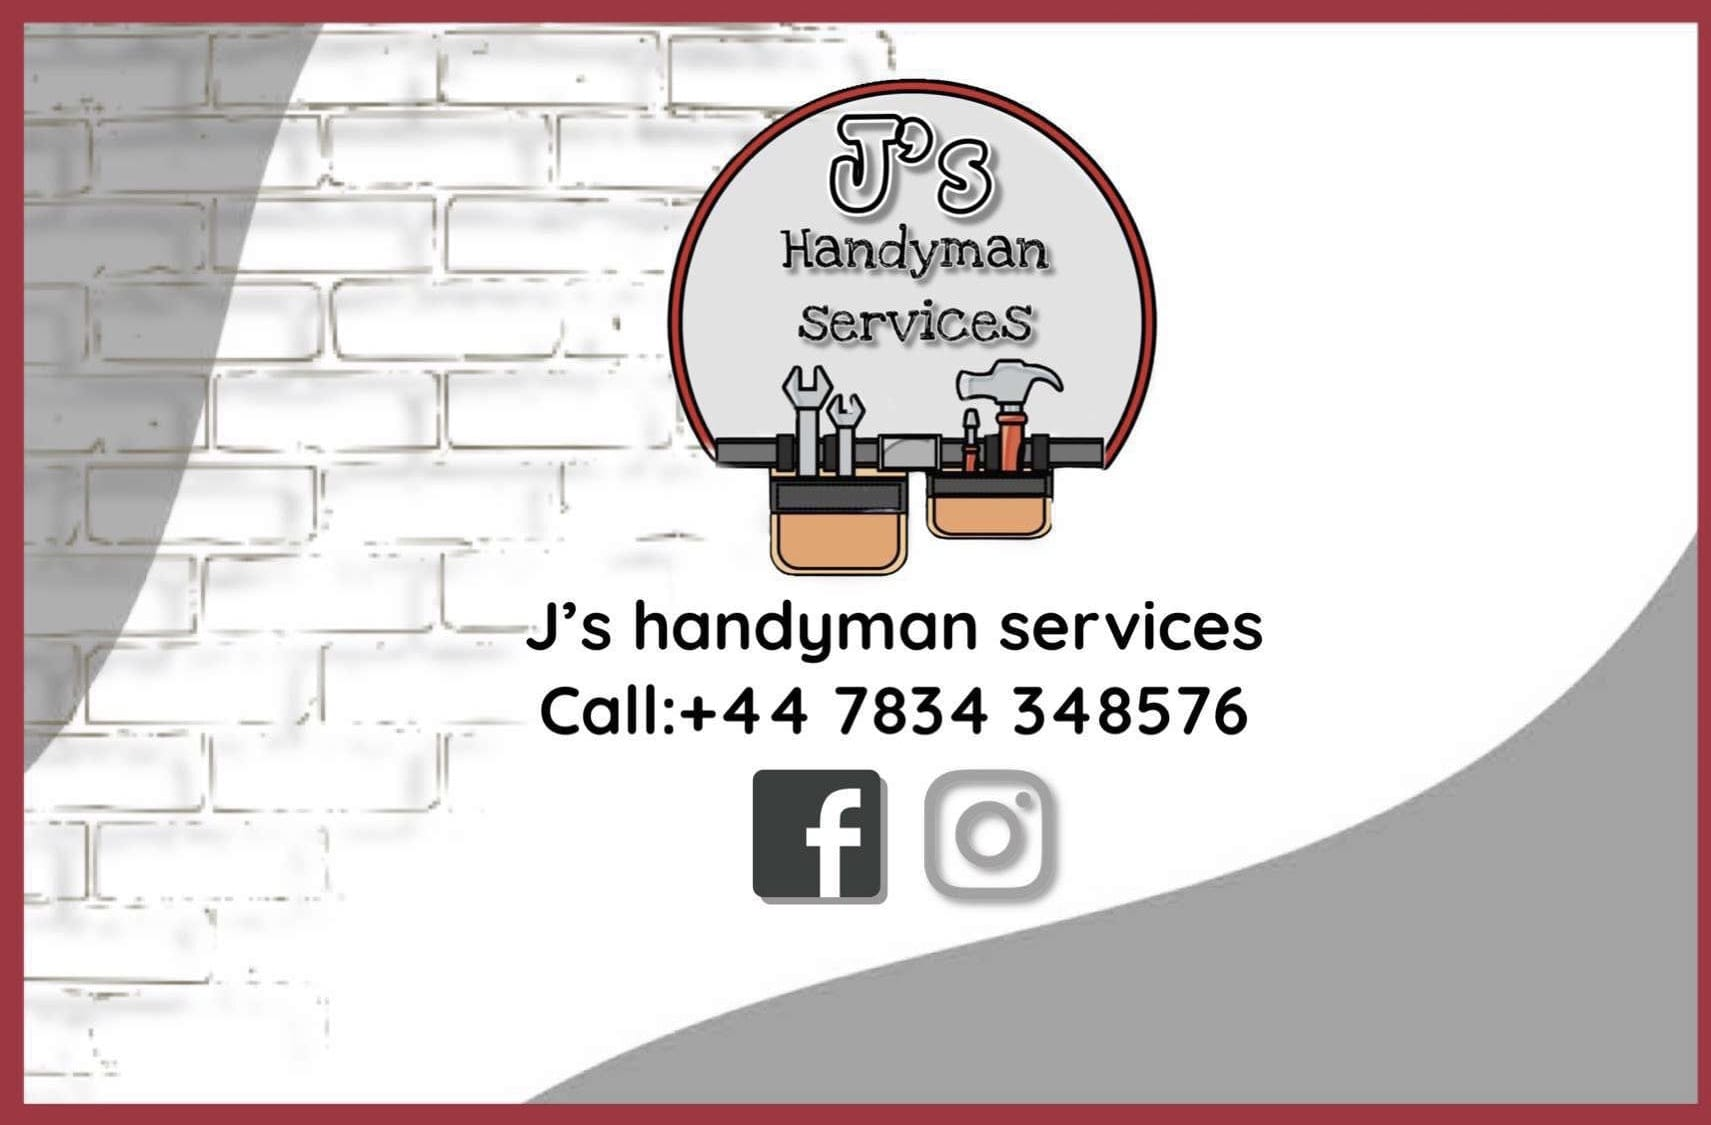 J's Handyman Services